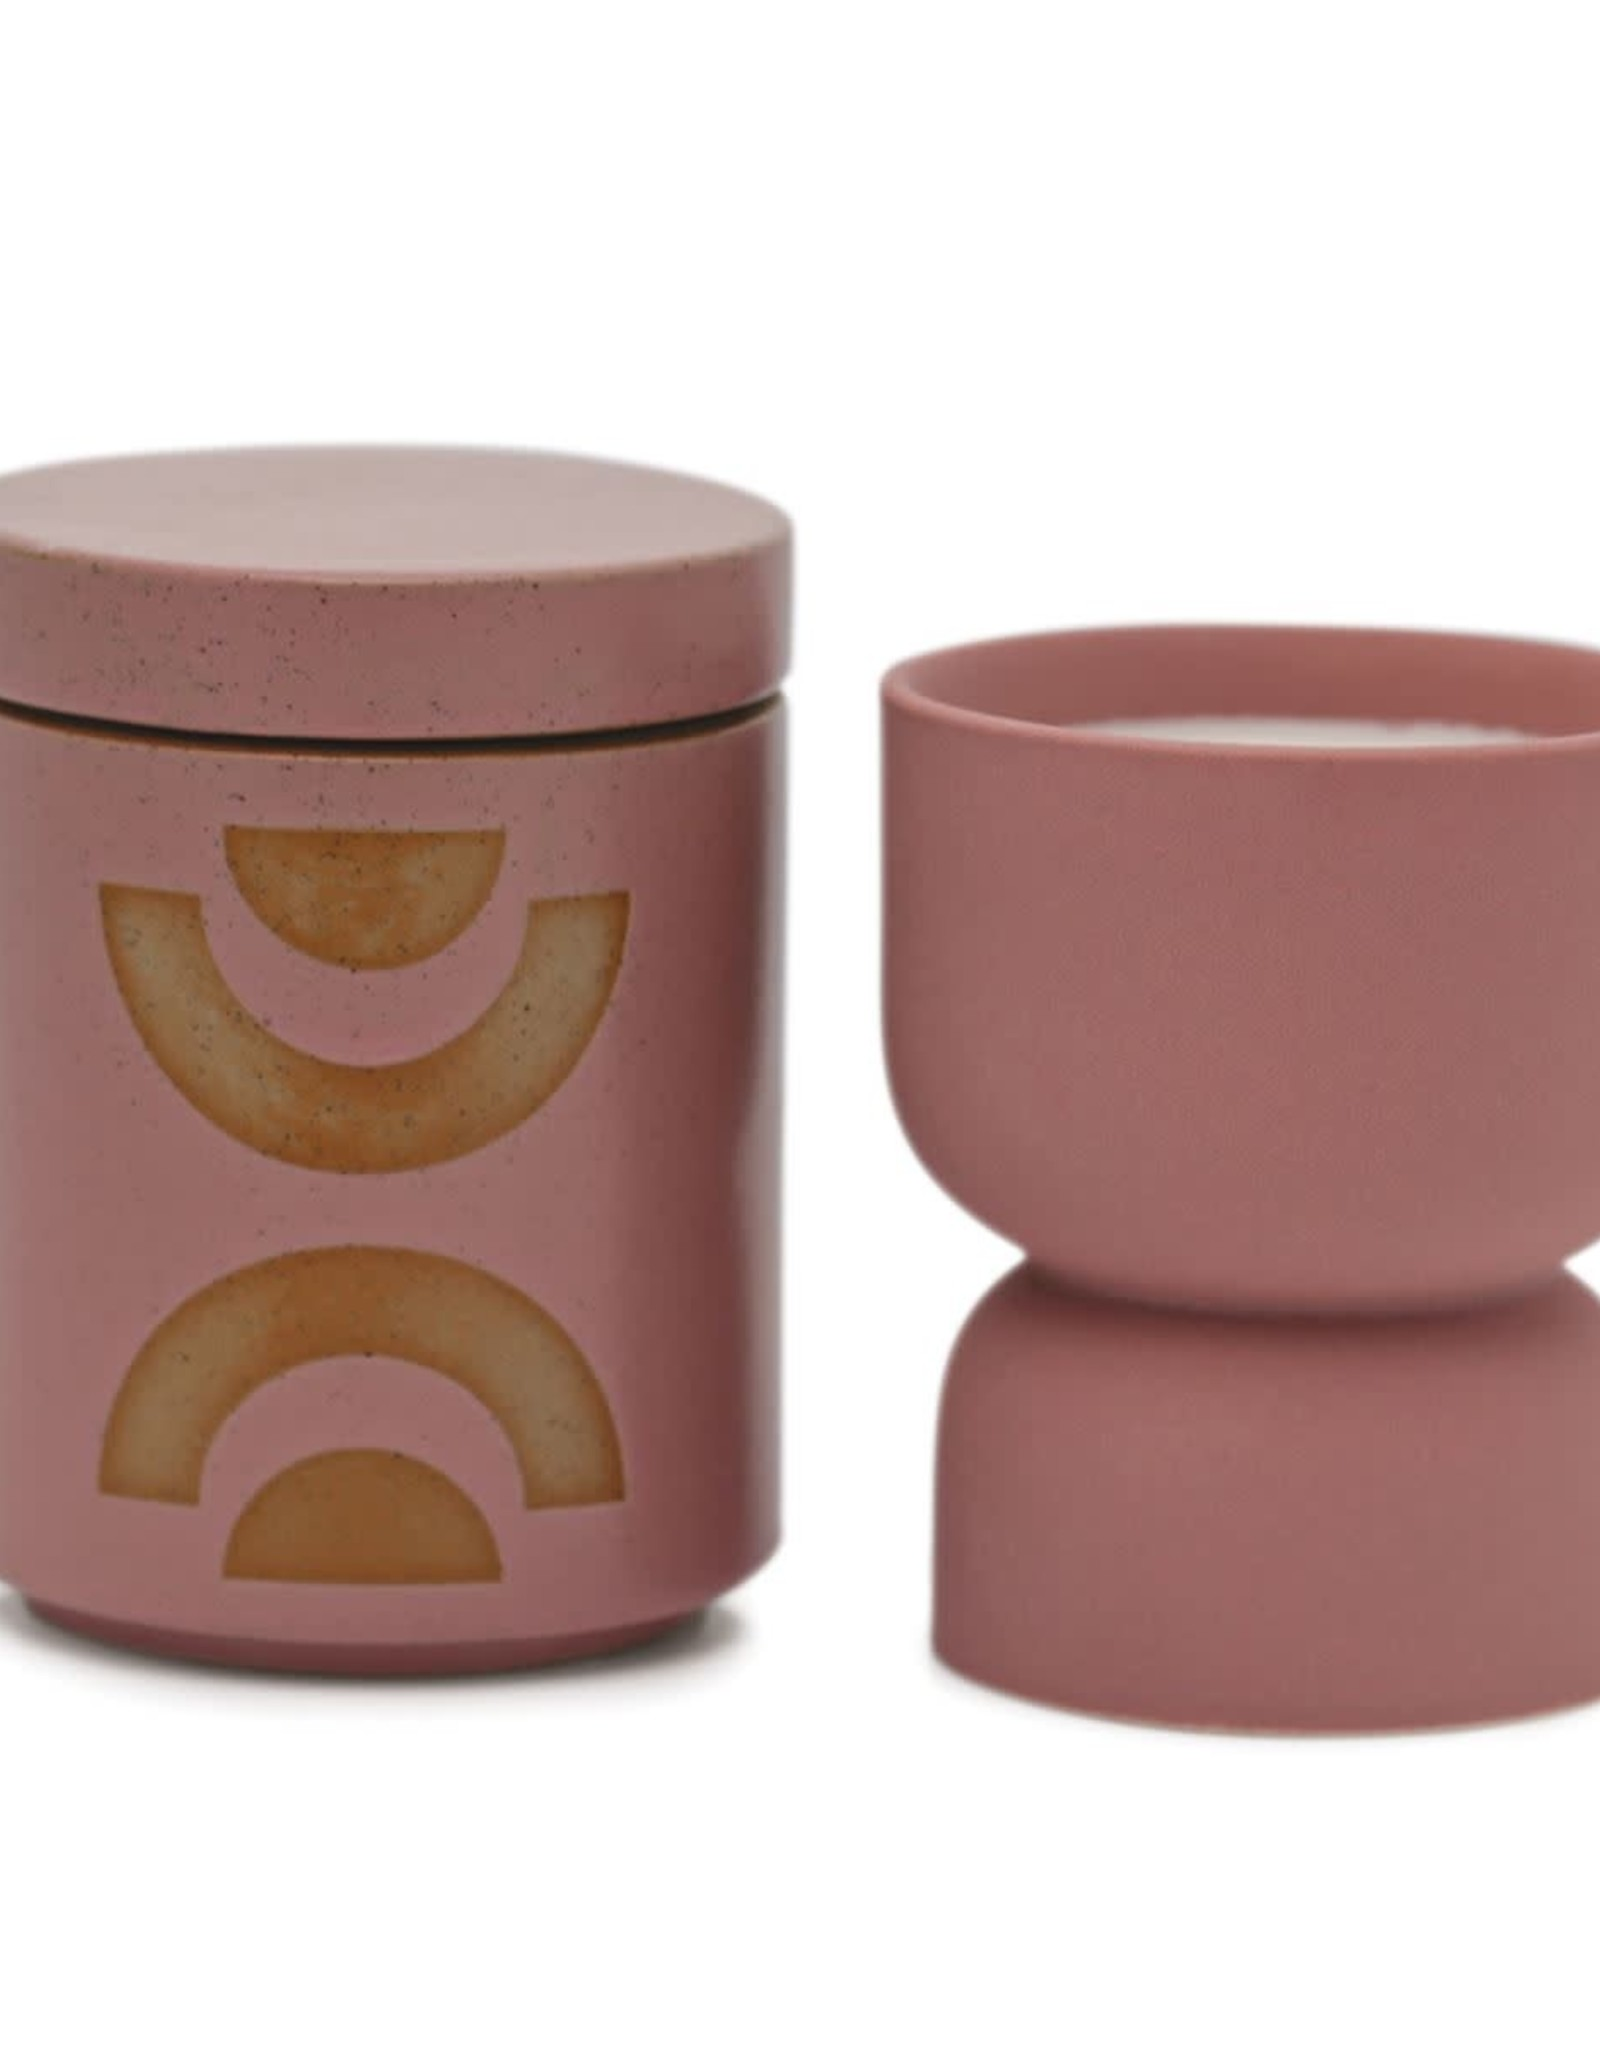 Mandarin and Mango Candle